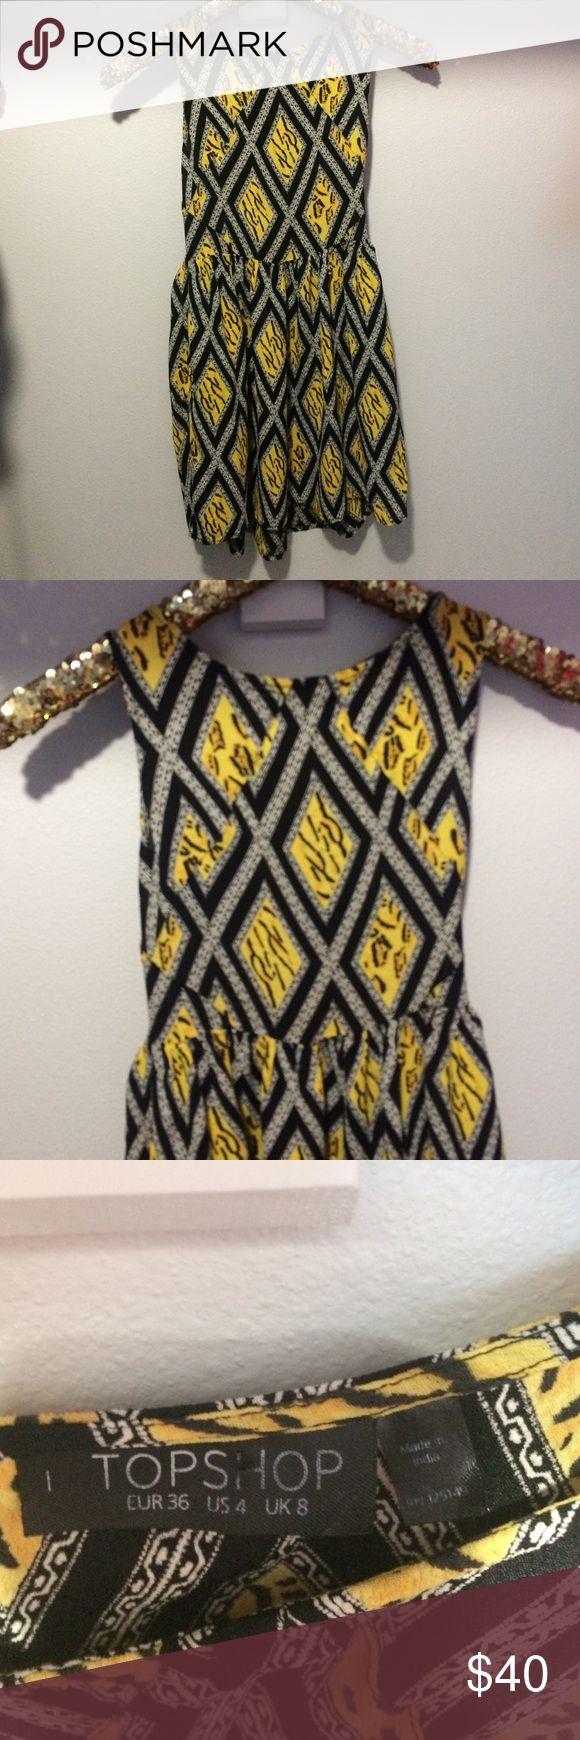 Topshop Dress Topshop dress with side zipper and pockets. Excellent condition. Topshop Dresses Mini